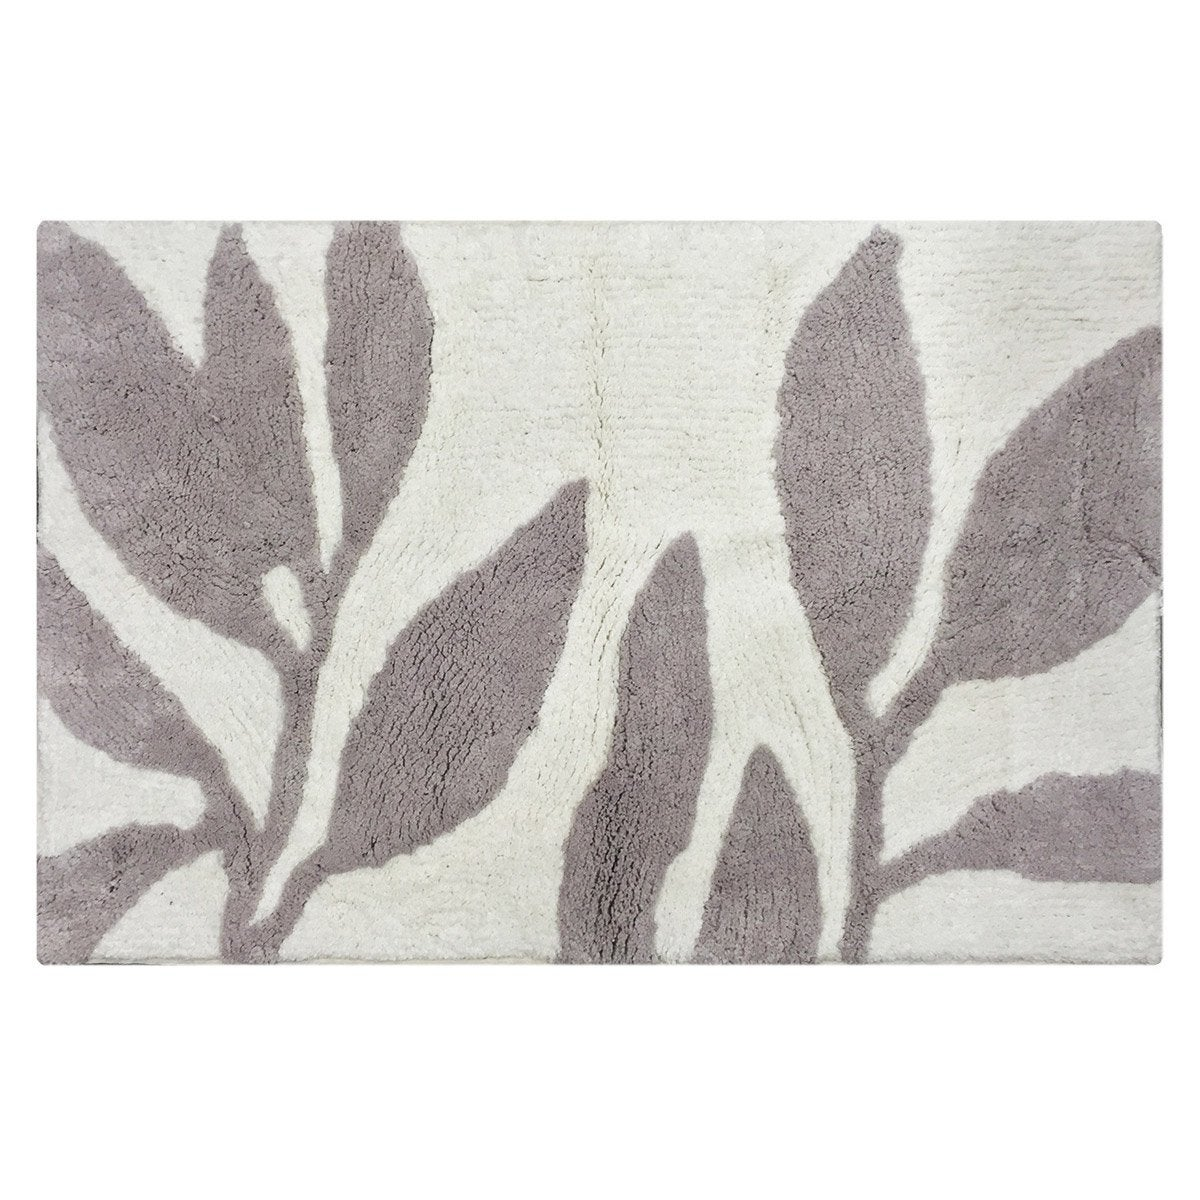 tapis de bain x cm gris poivr n 5 leaf sensea leroy merlin. Black Bedroom Furniture Sets. Home Design Ideas